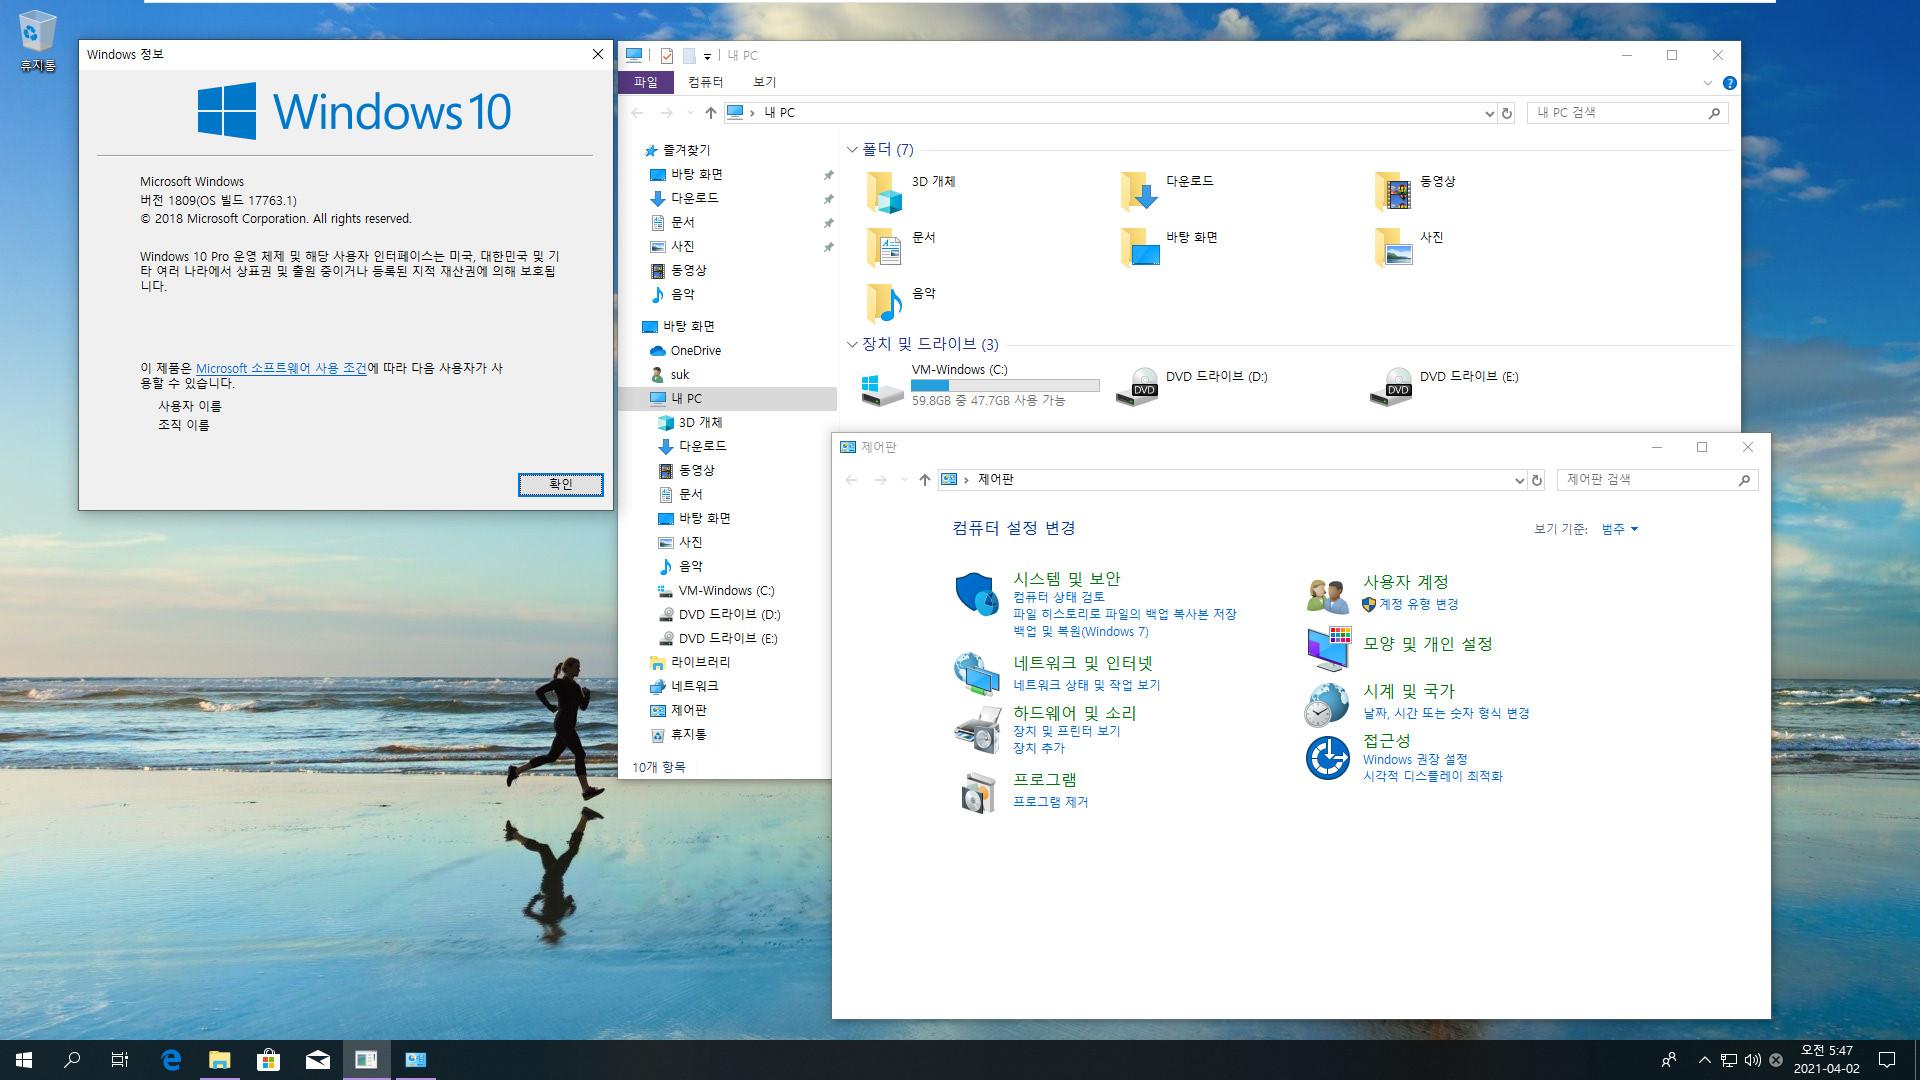 imageres.dll 적용하면 부팅이 안 되는 윈도우는 imageres.dll 2개를 합치면 부팅 됩니다 2021-04-02_054713.jpg